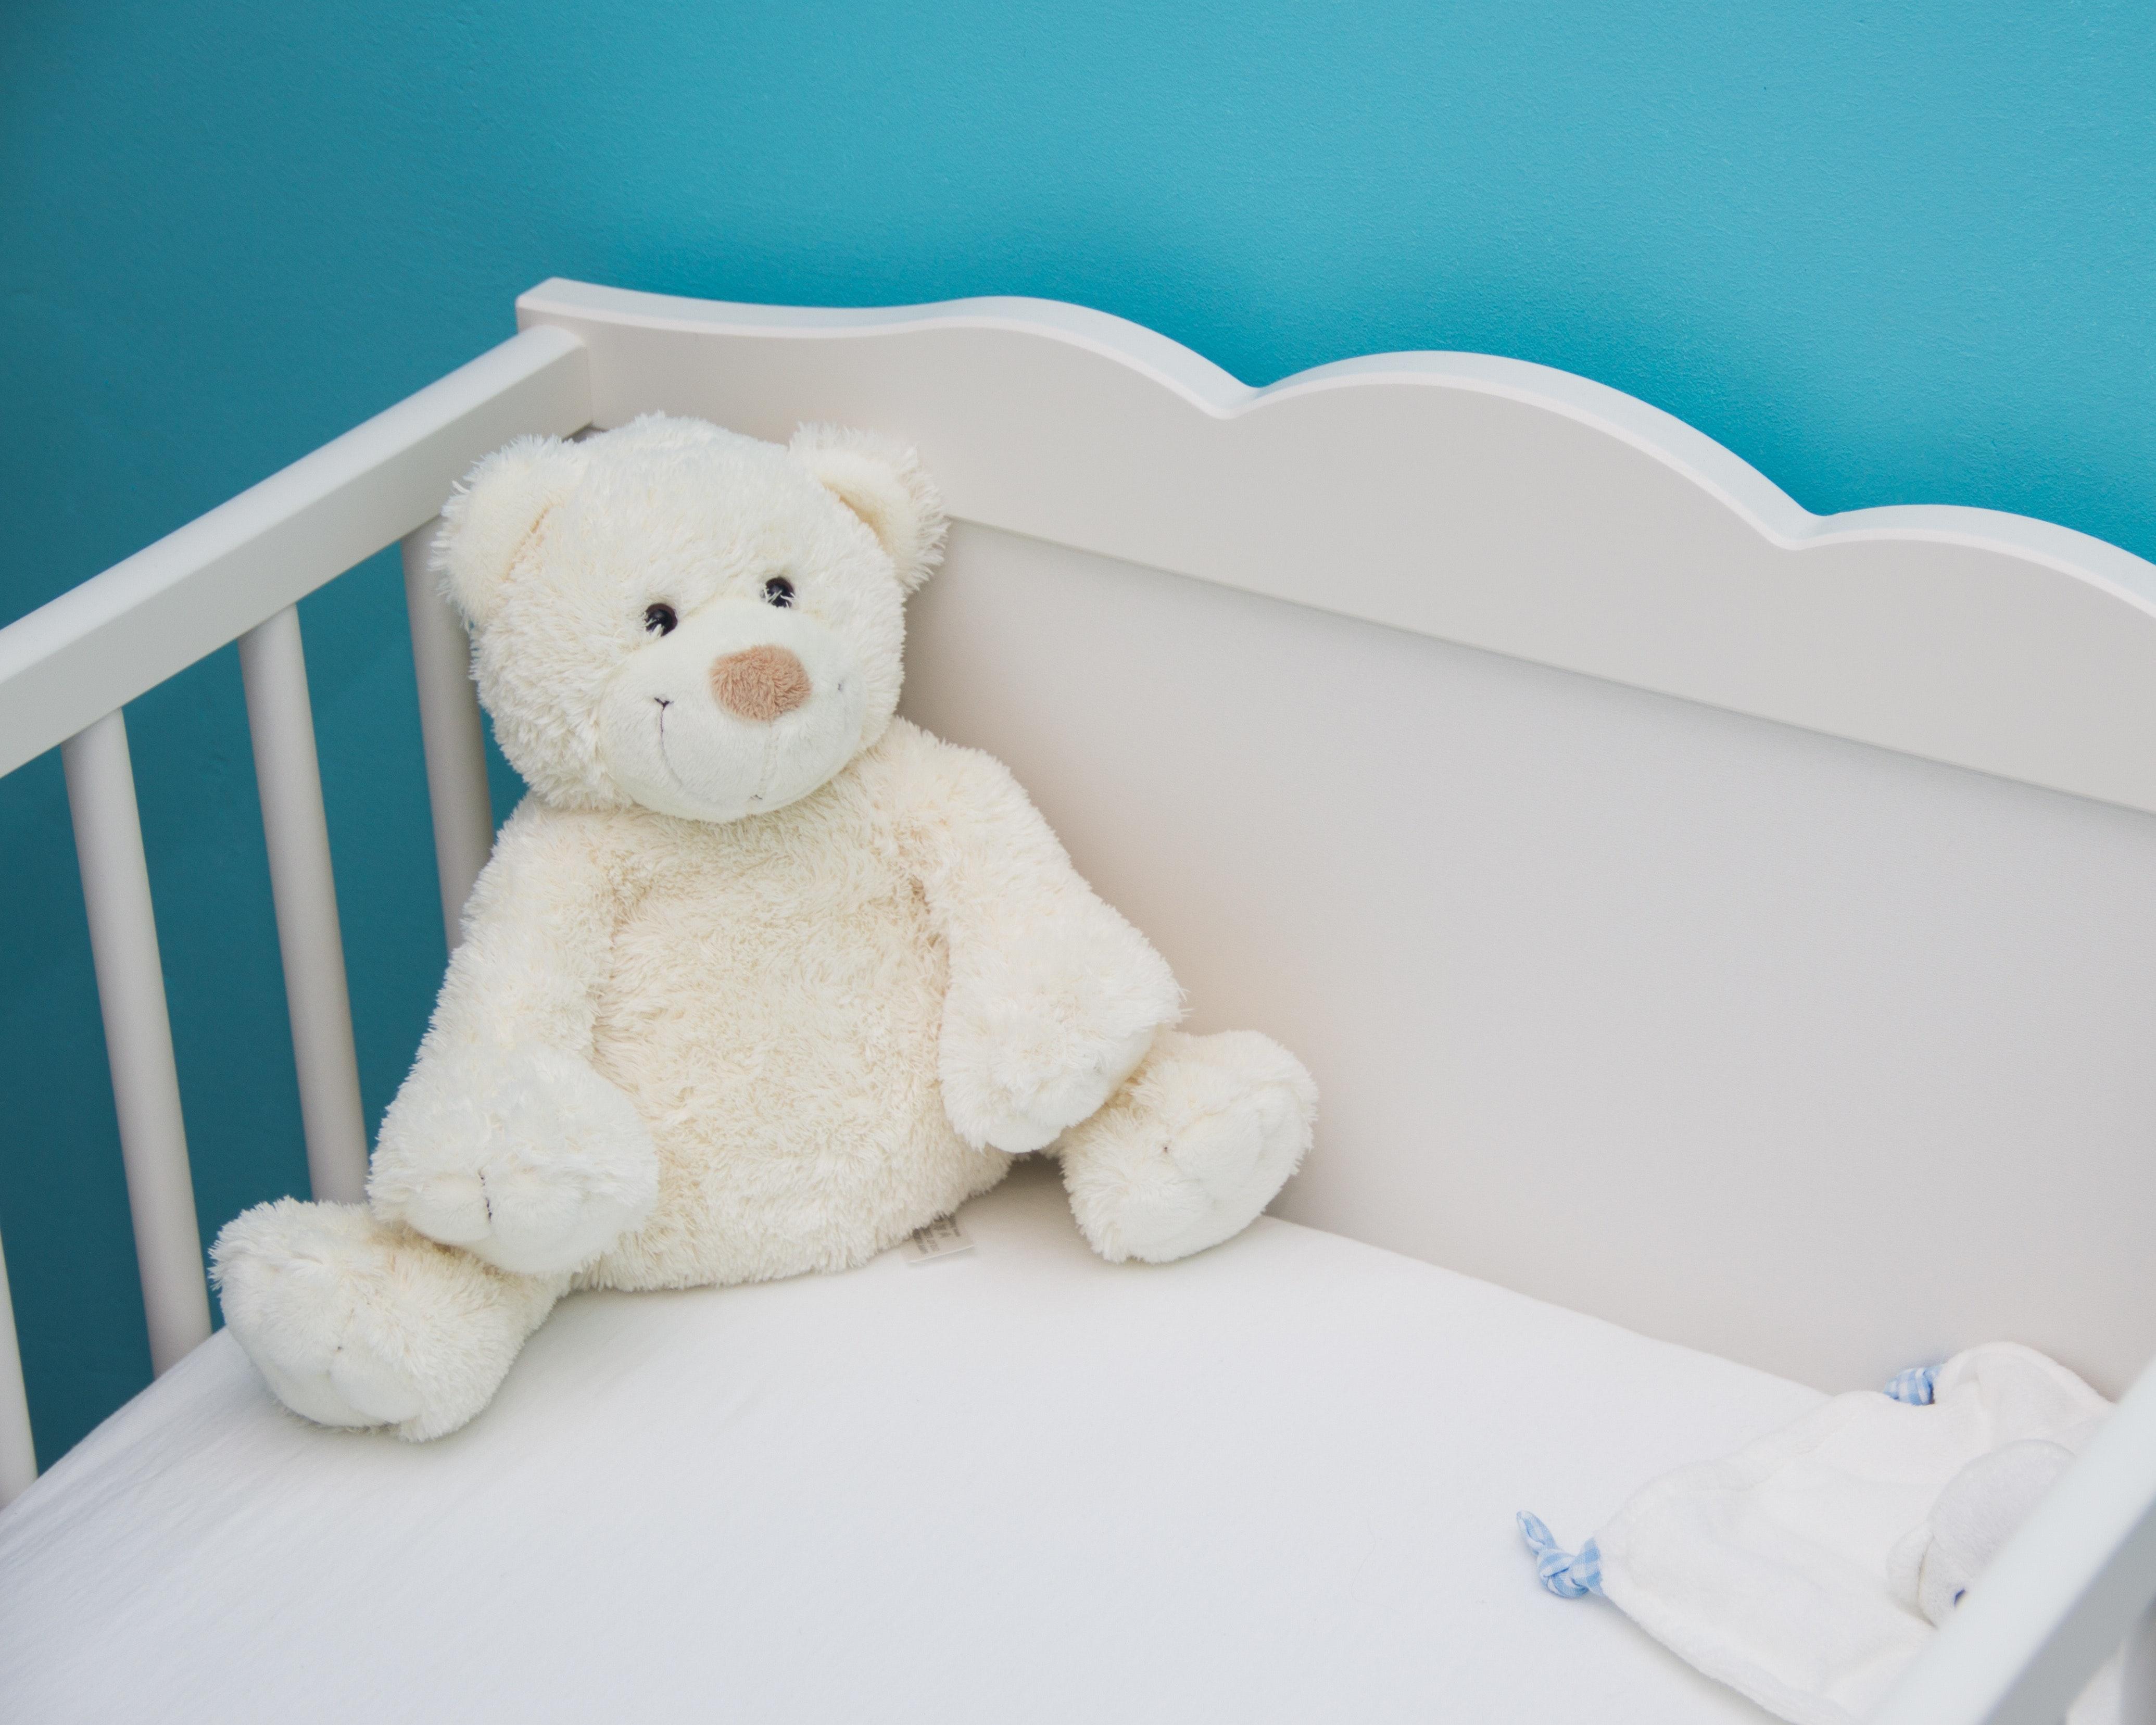 Programi lojalnosti za mame, bebe i trudnice